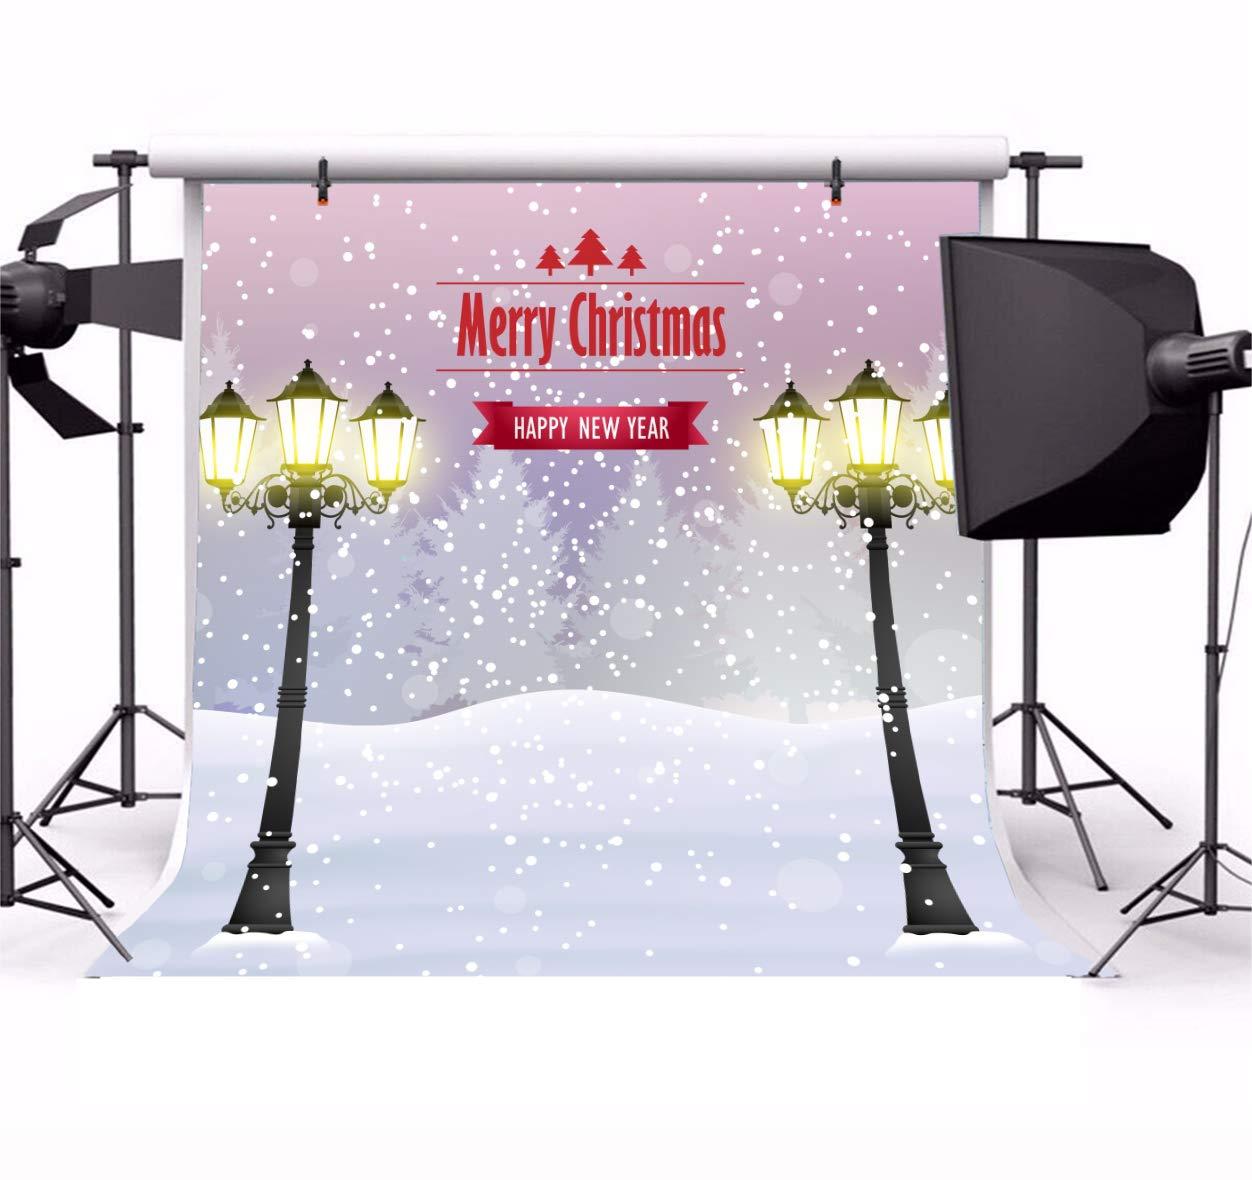 Leyiyi 8x8フィート メリークリスマス 写真撮影 背景 雪 街灯 白世界 雪 カバー 寒い冬 玄関 森 ピン 木 背景 ハッピーニューイヤー クリスマス 写真 ポートレート ビニール スタジオ 小道具   B07H1MVV16